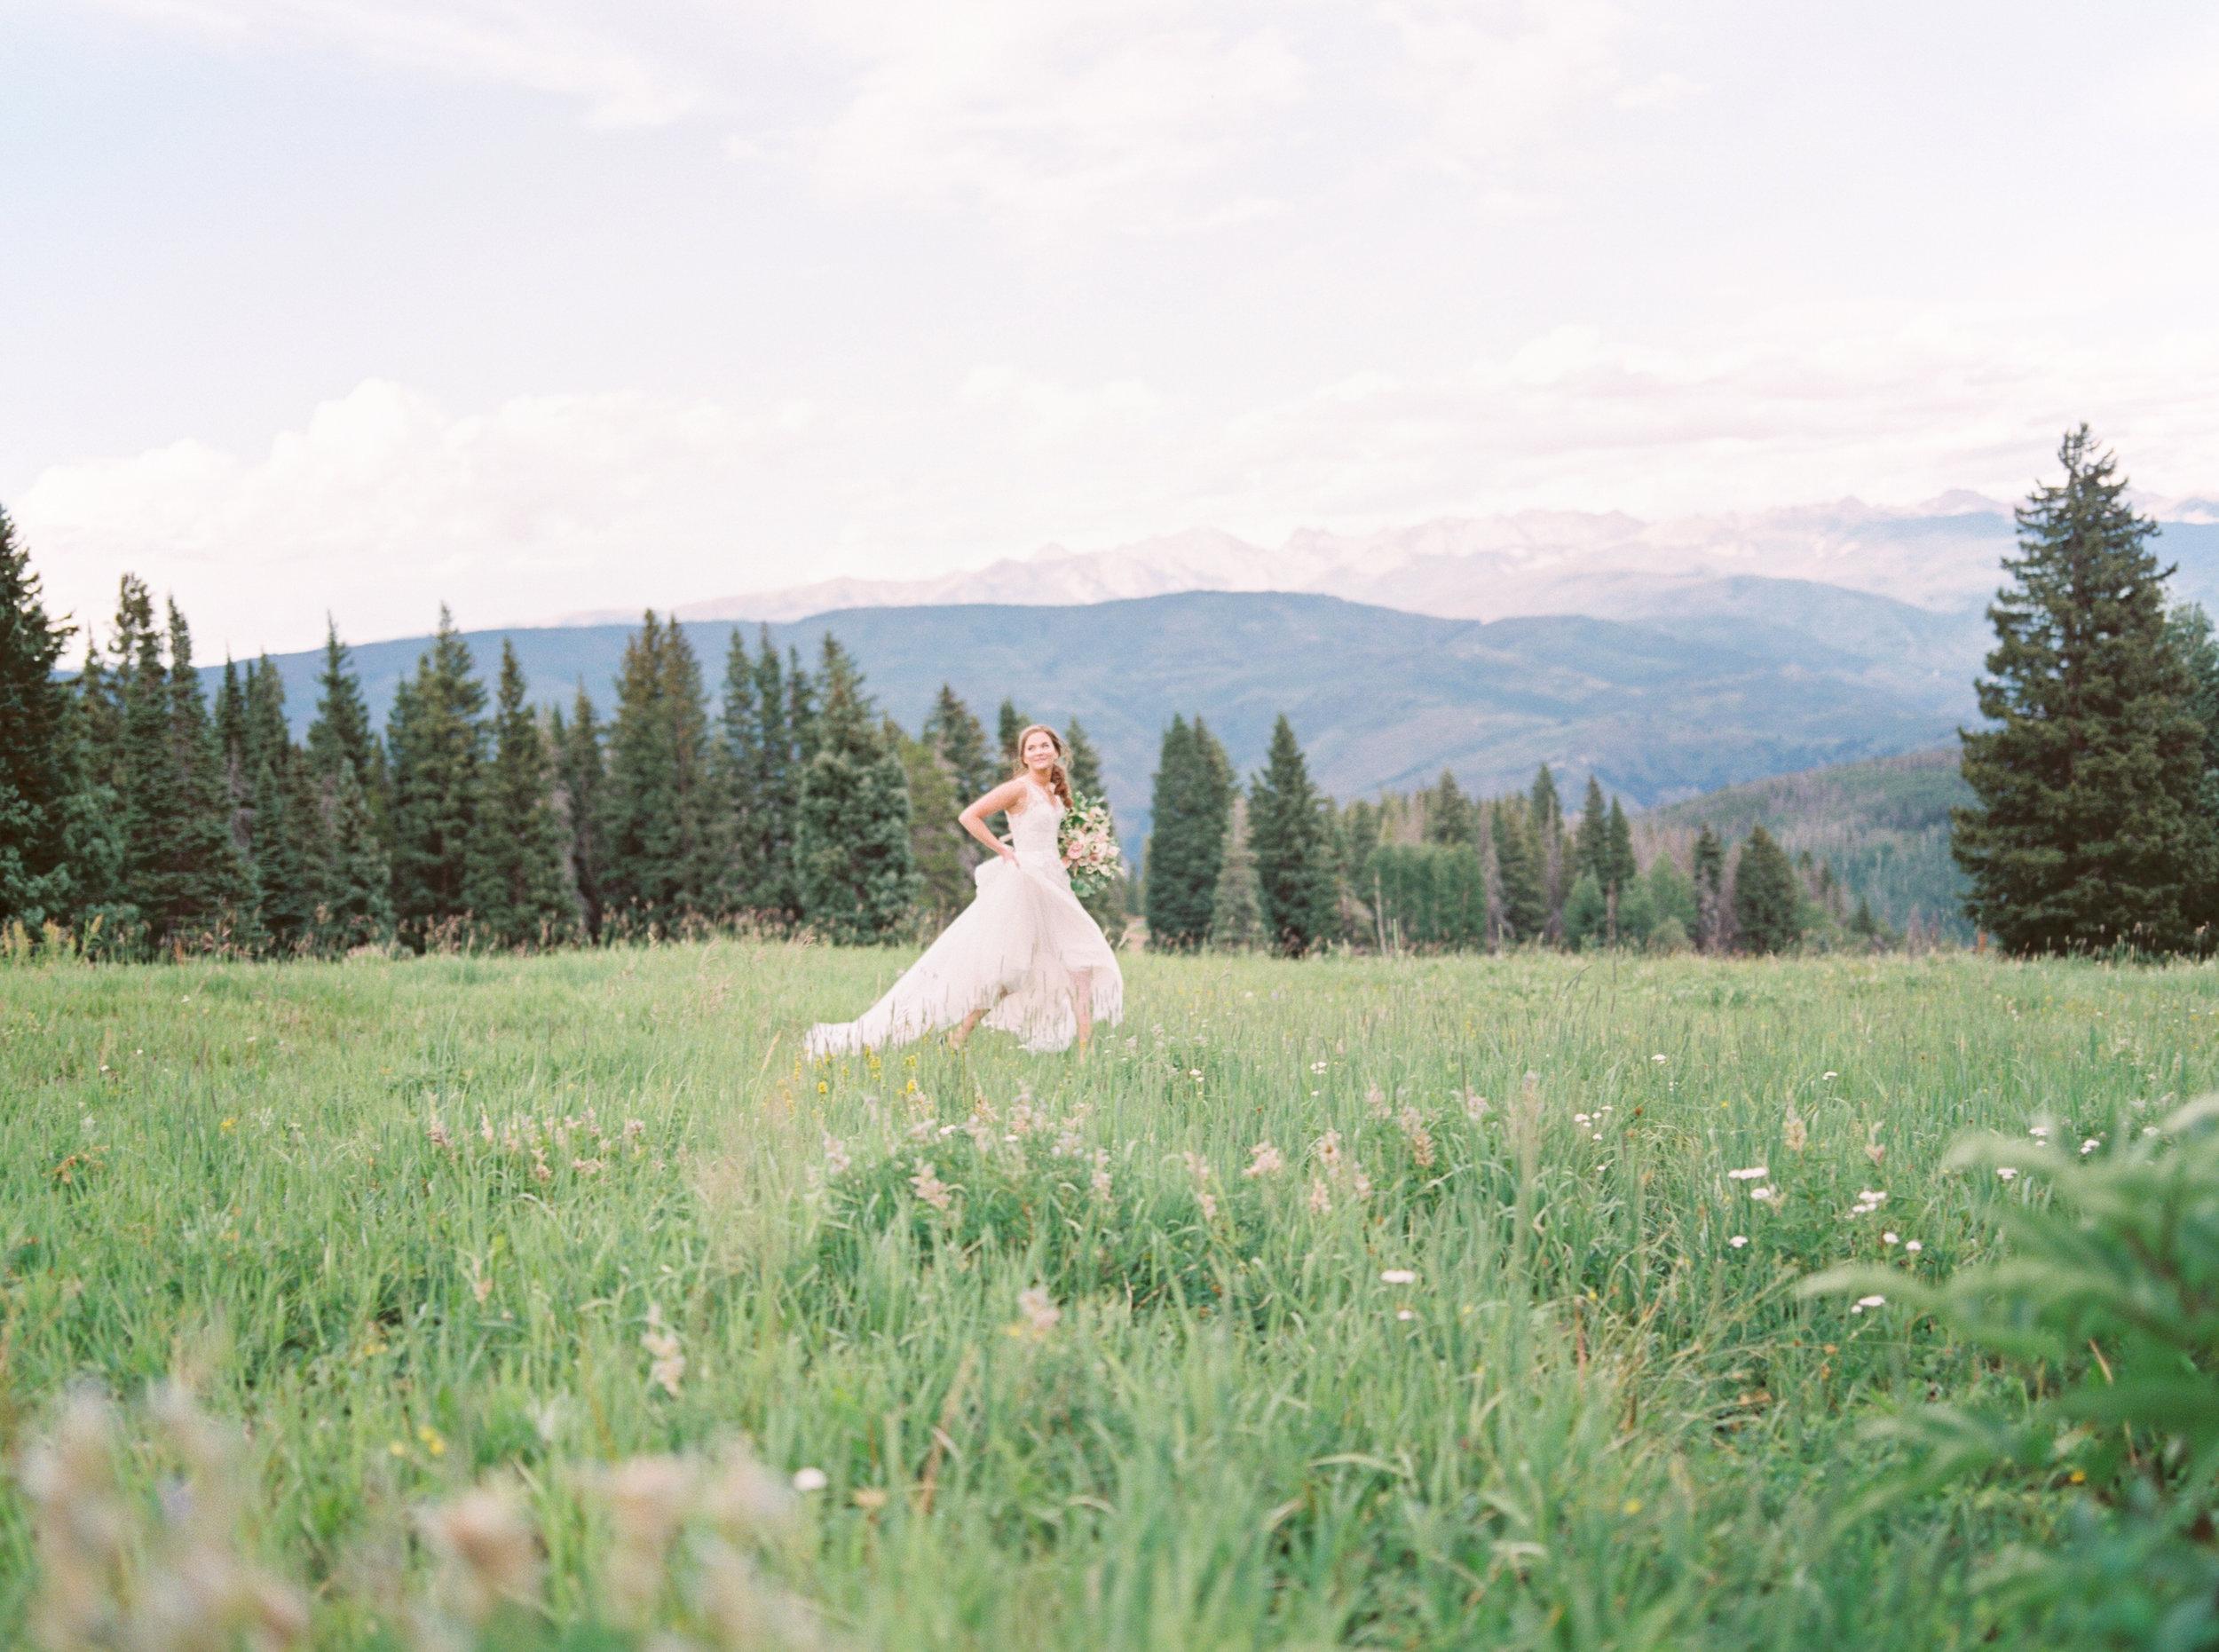 Callie Manion Photography_Beaver Creek Editorial_097 copy.JPG